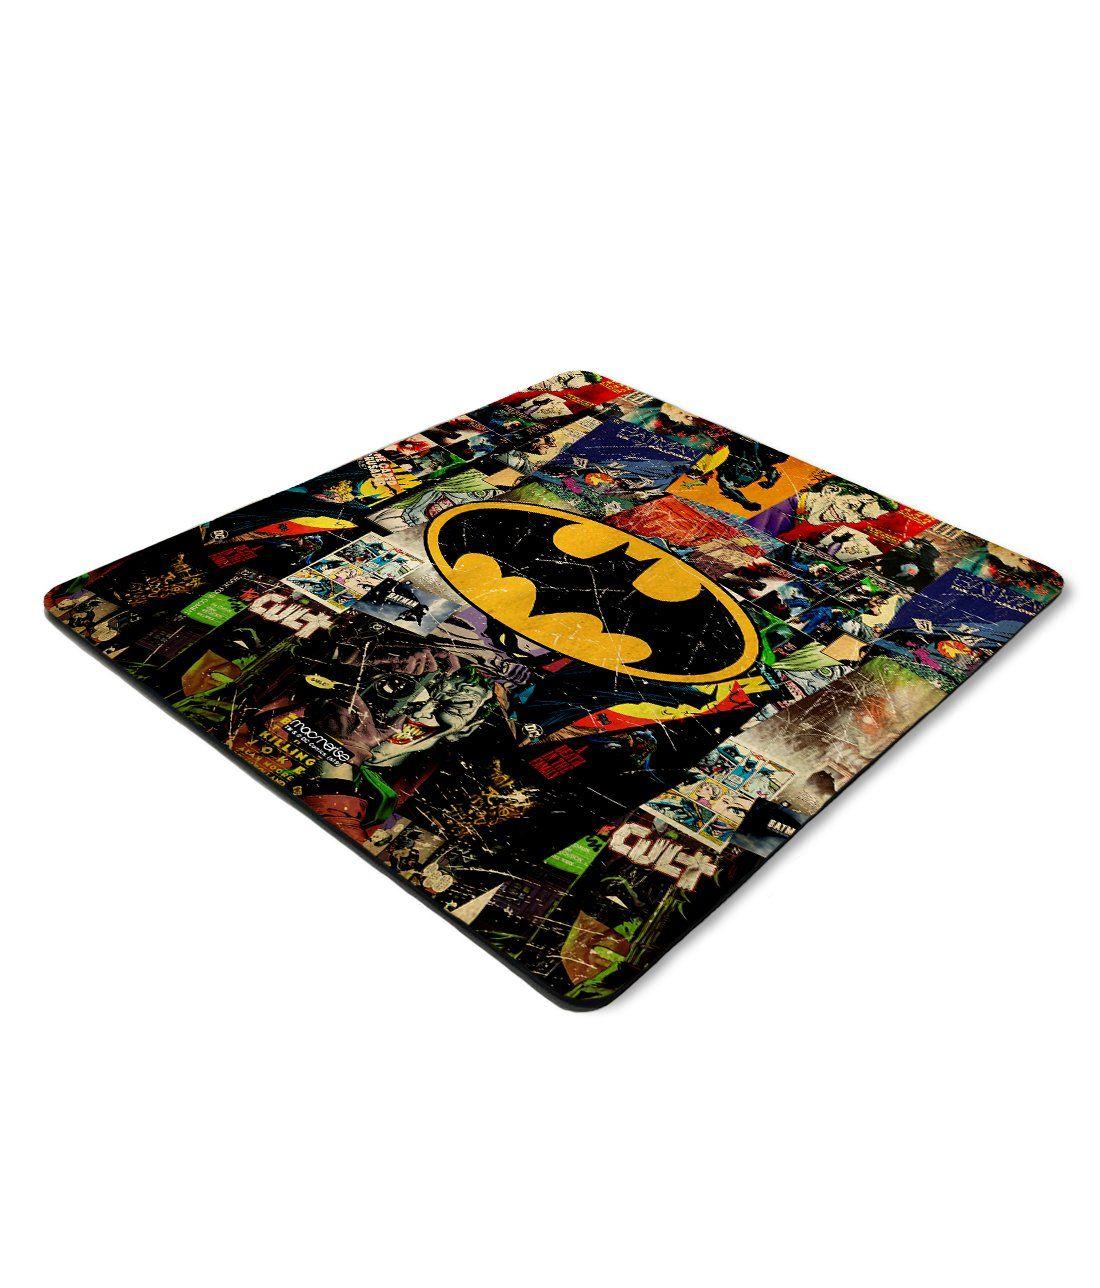 Comic Bat - Macmerise Mouse Pad